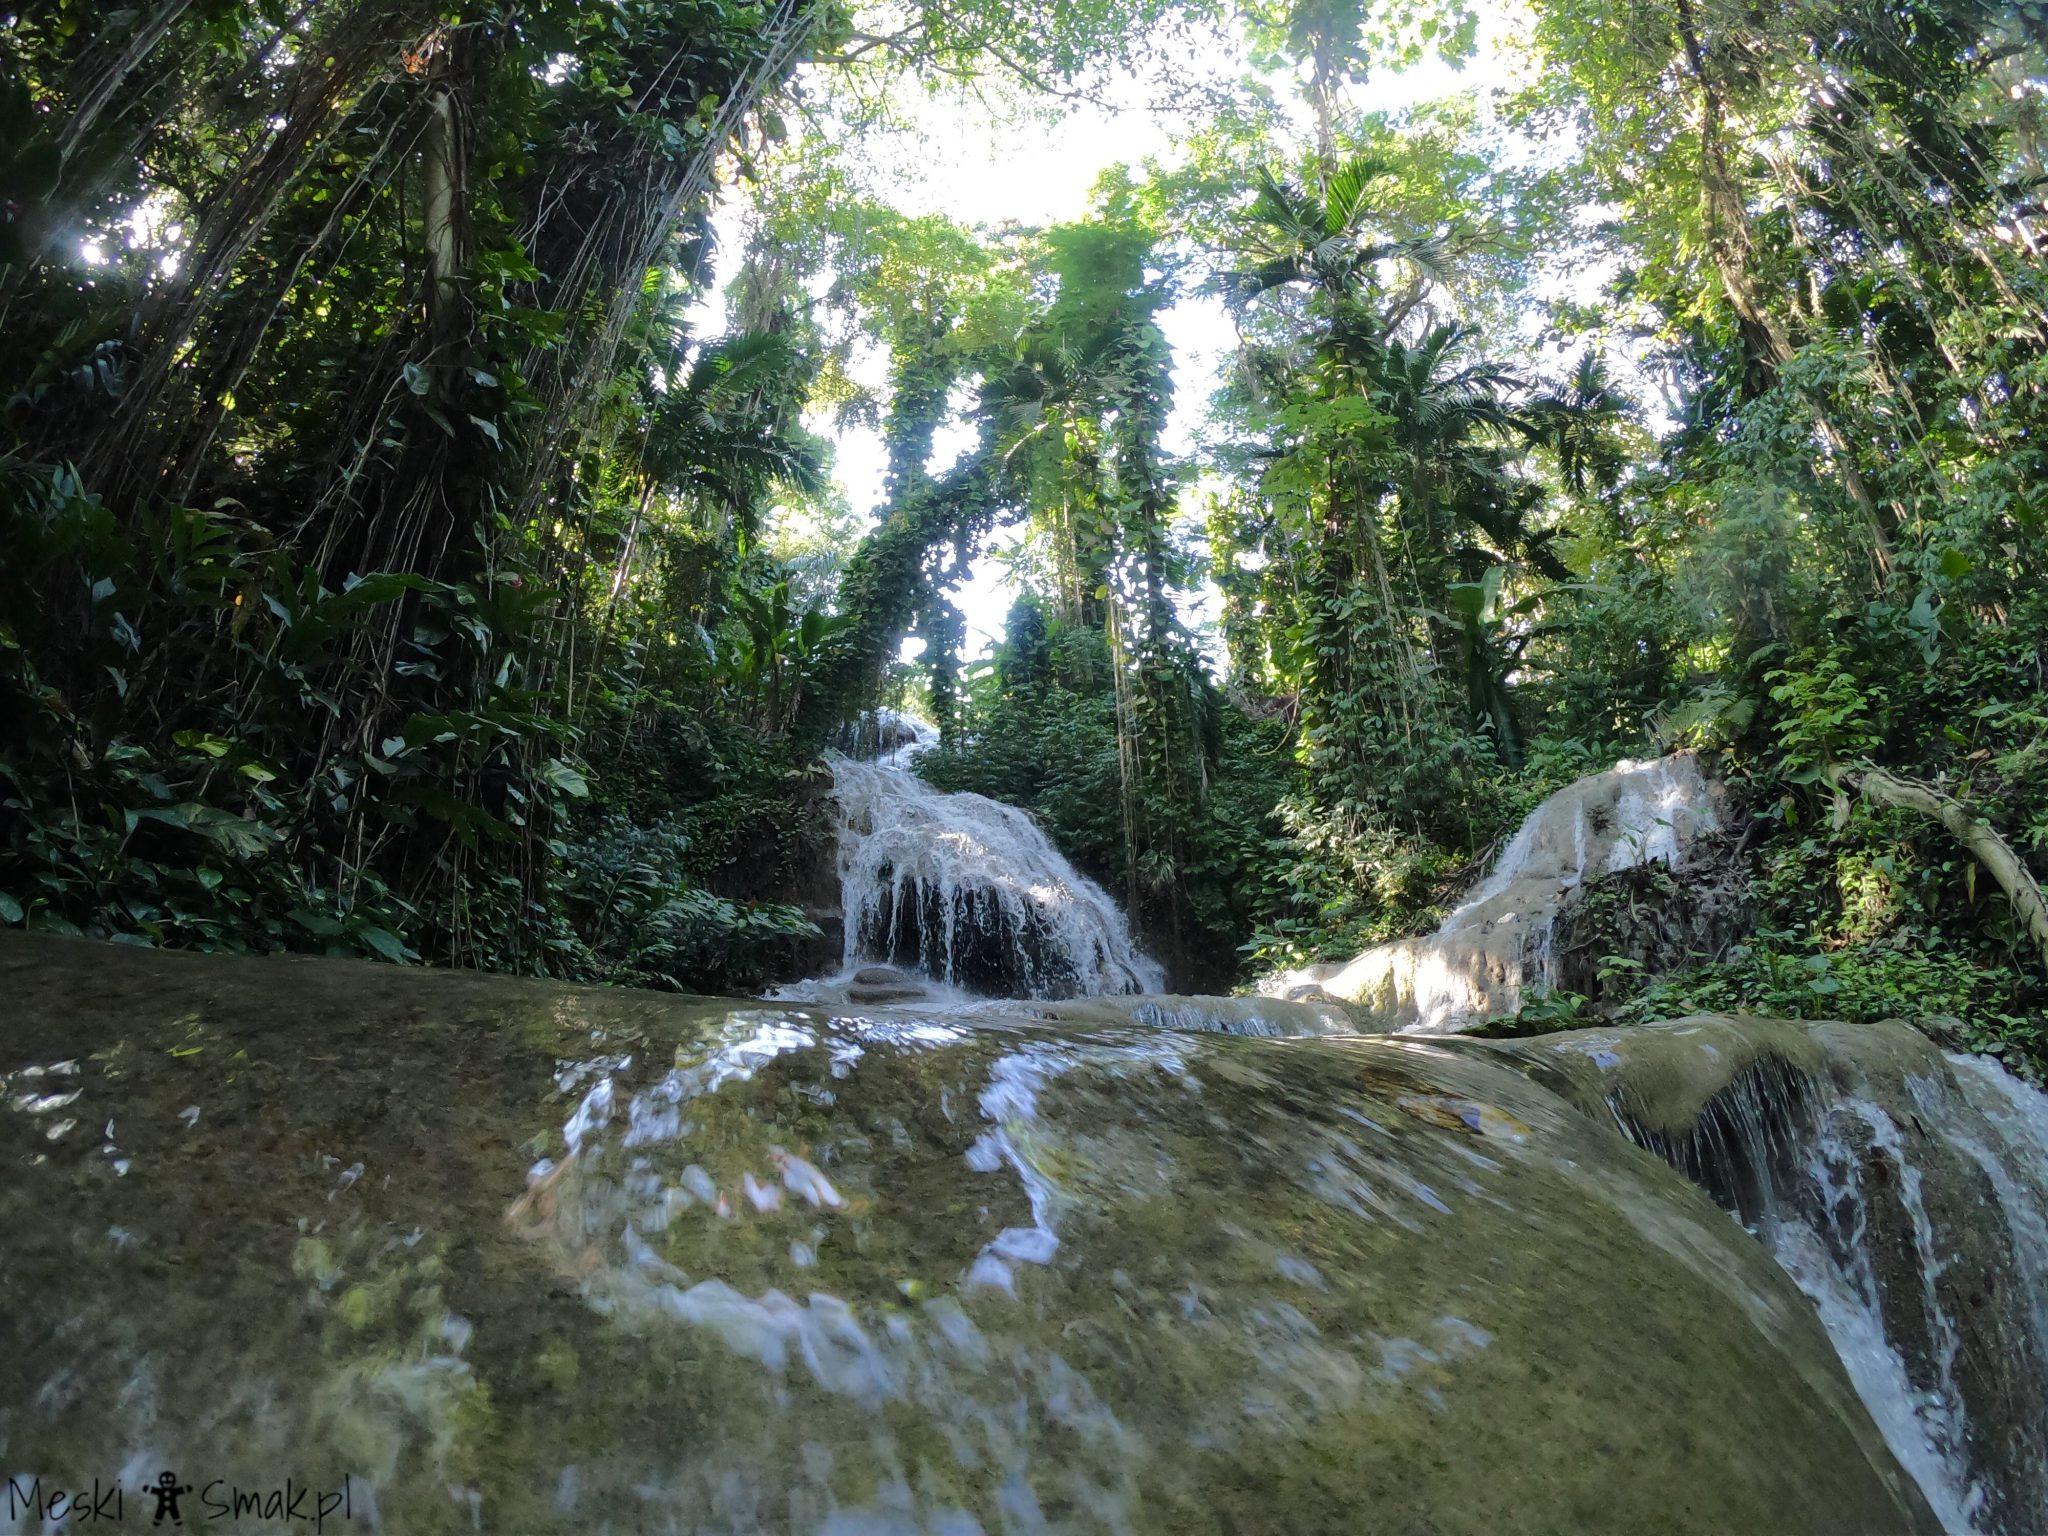 jamajka wakacje_The Turtle River Falls & Gardens 4